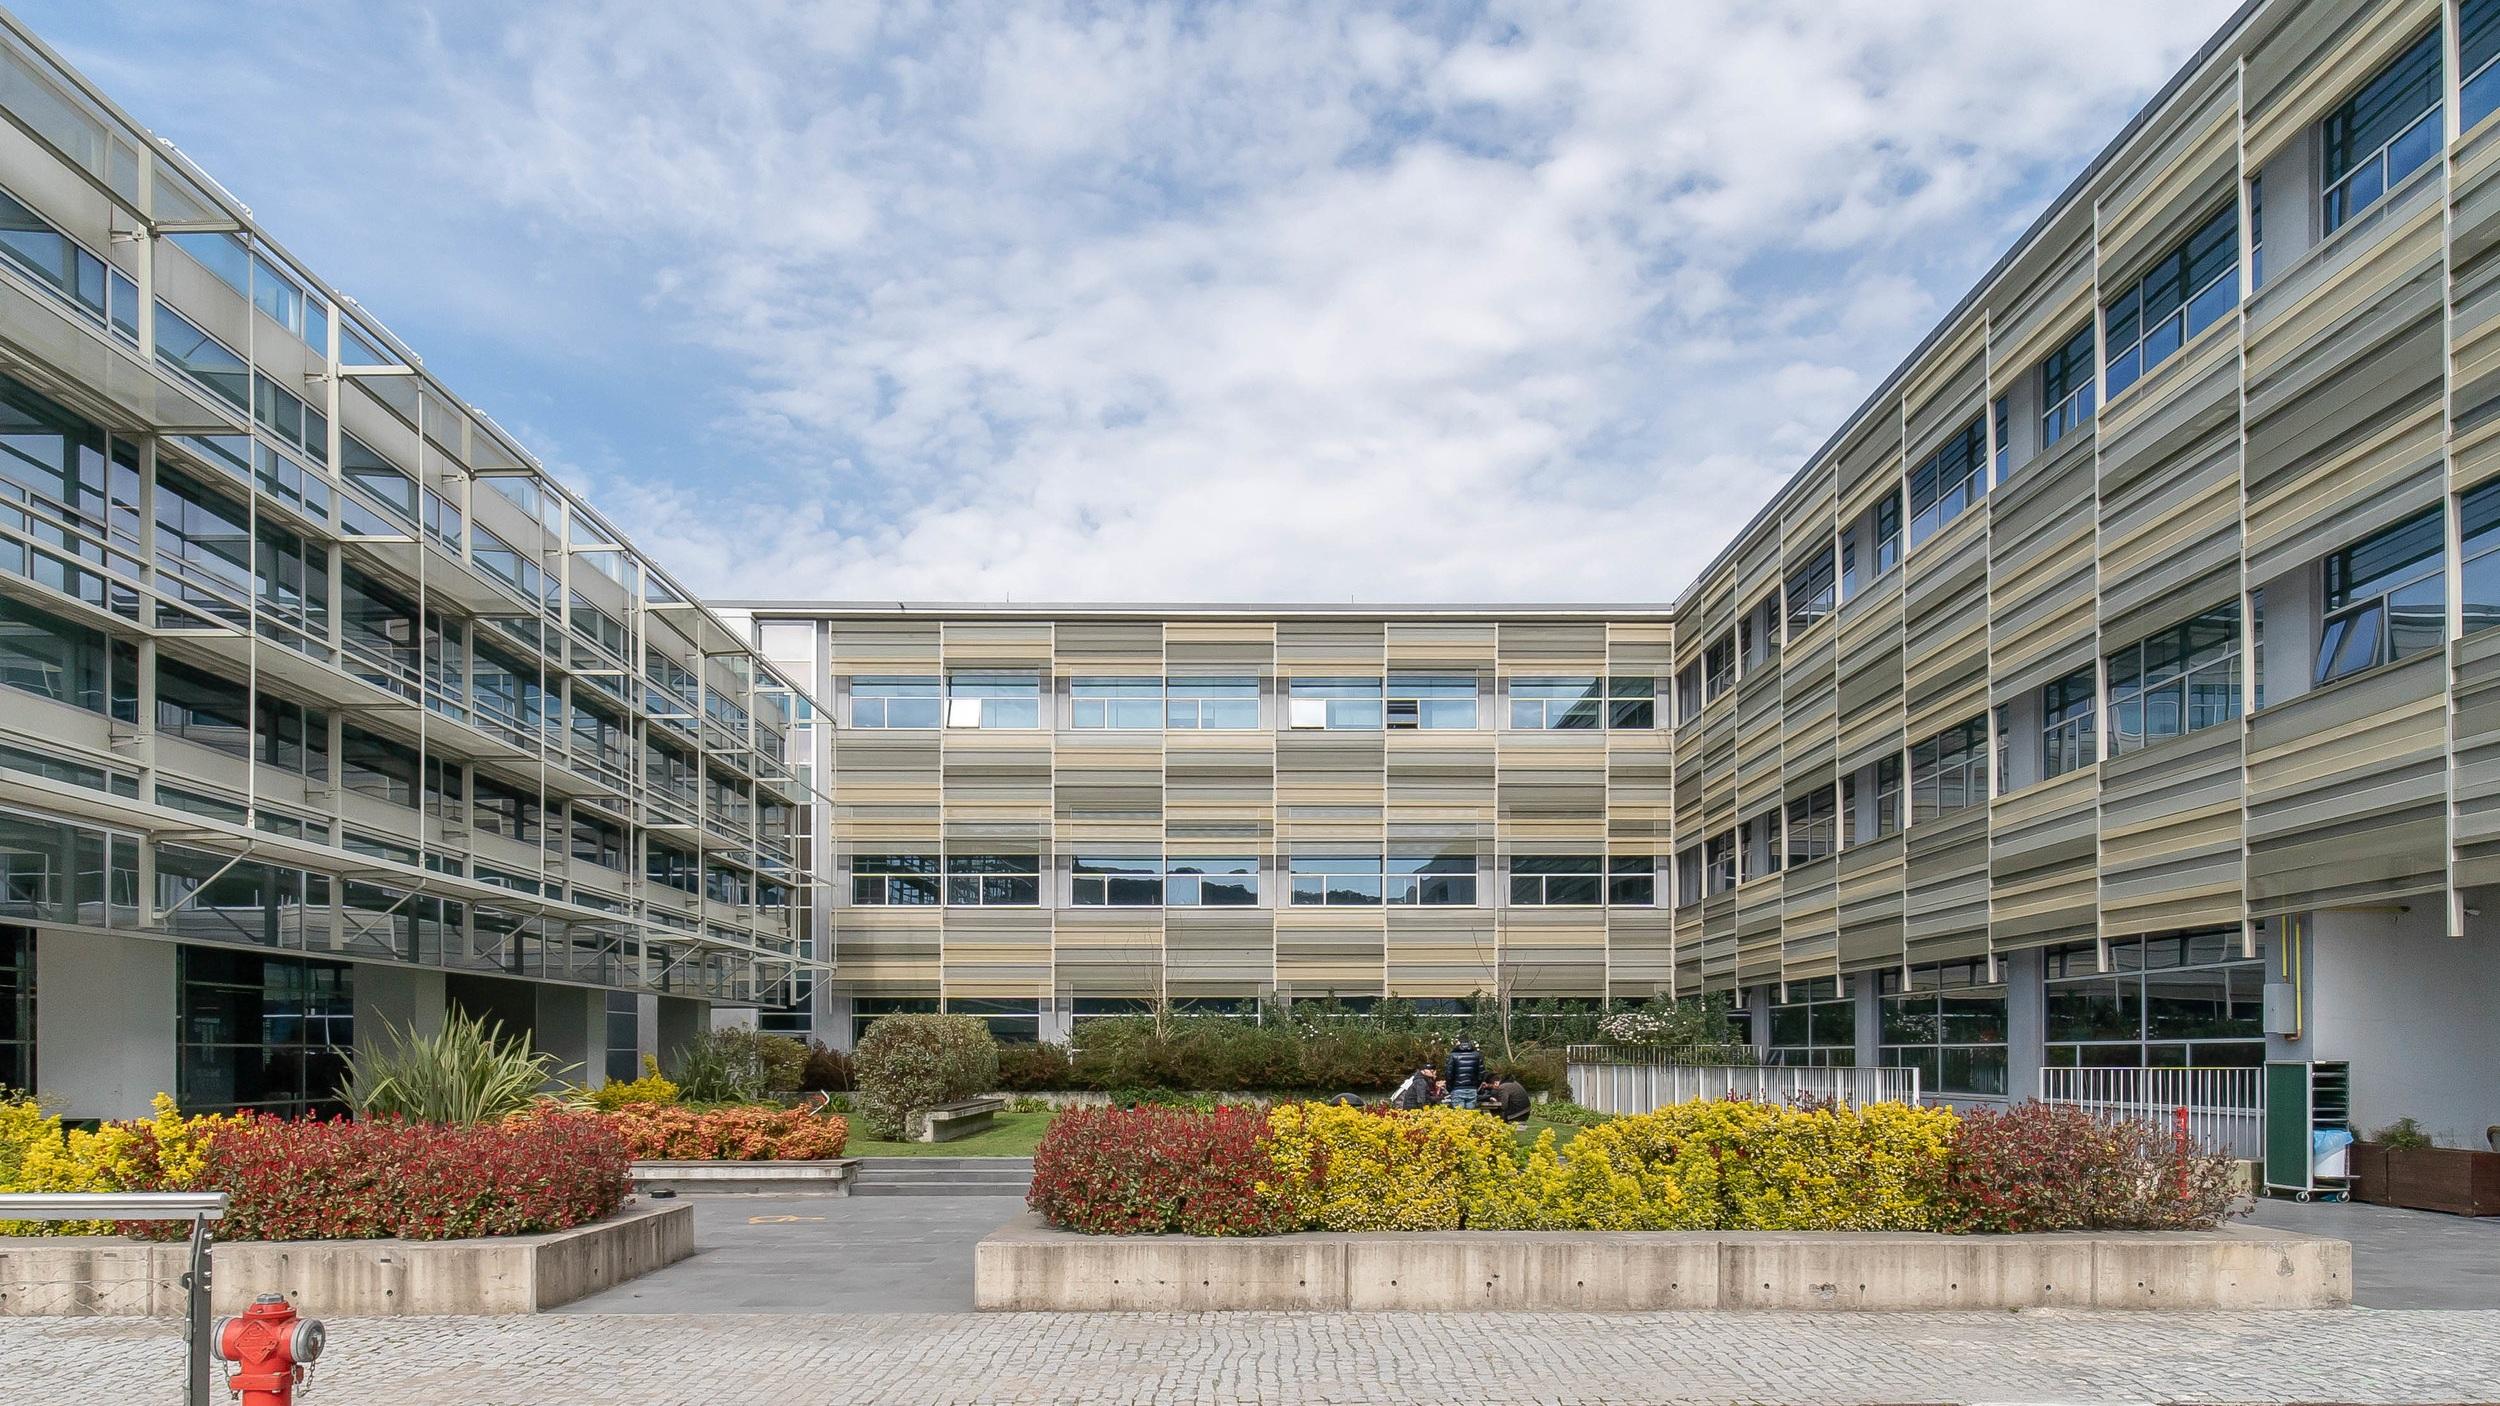 OZU Faculty of Law